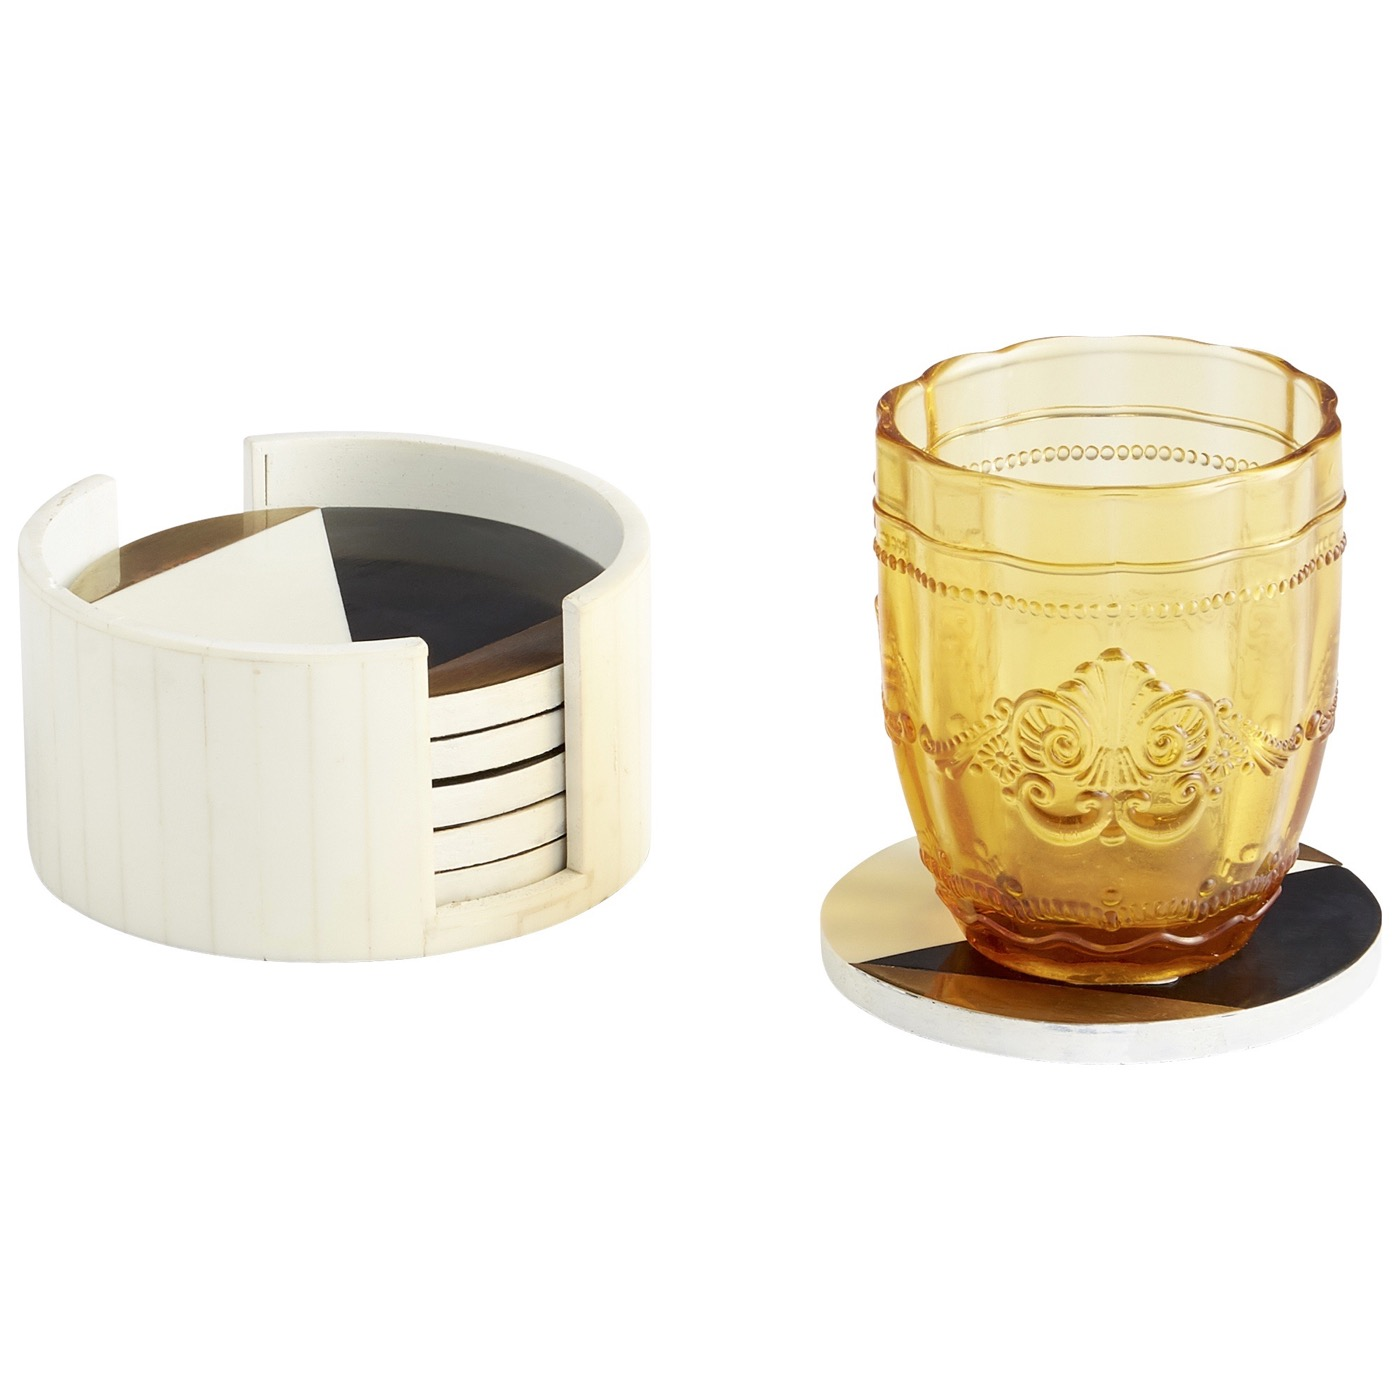 Bogart Geometric Coasters Set